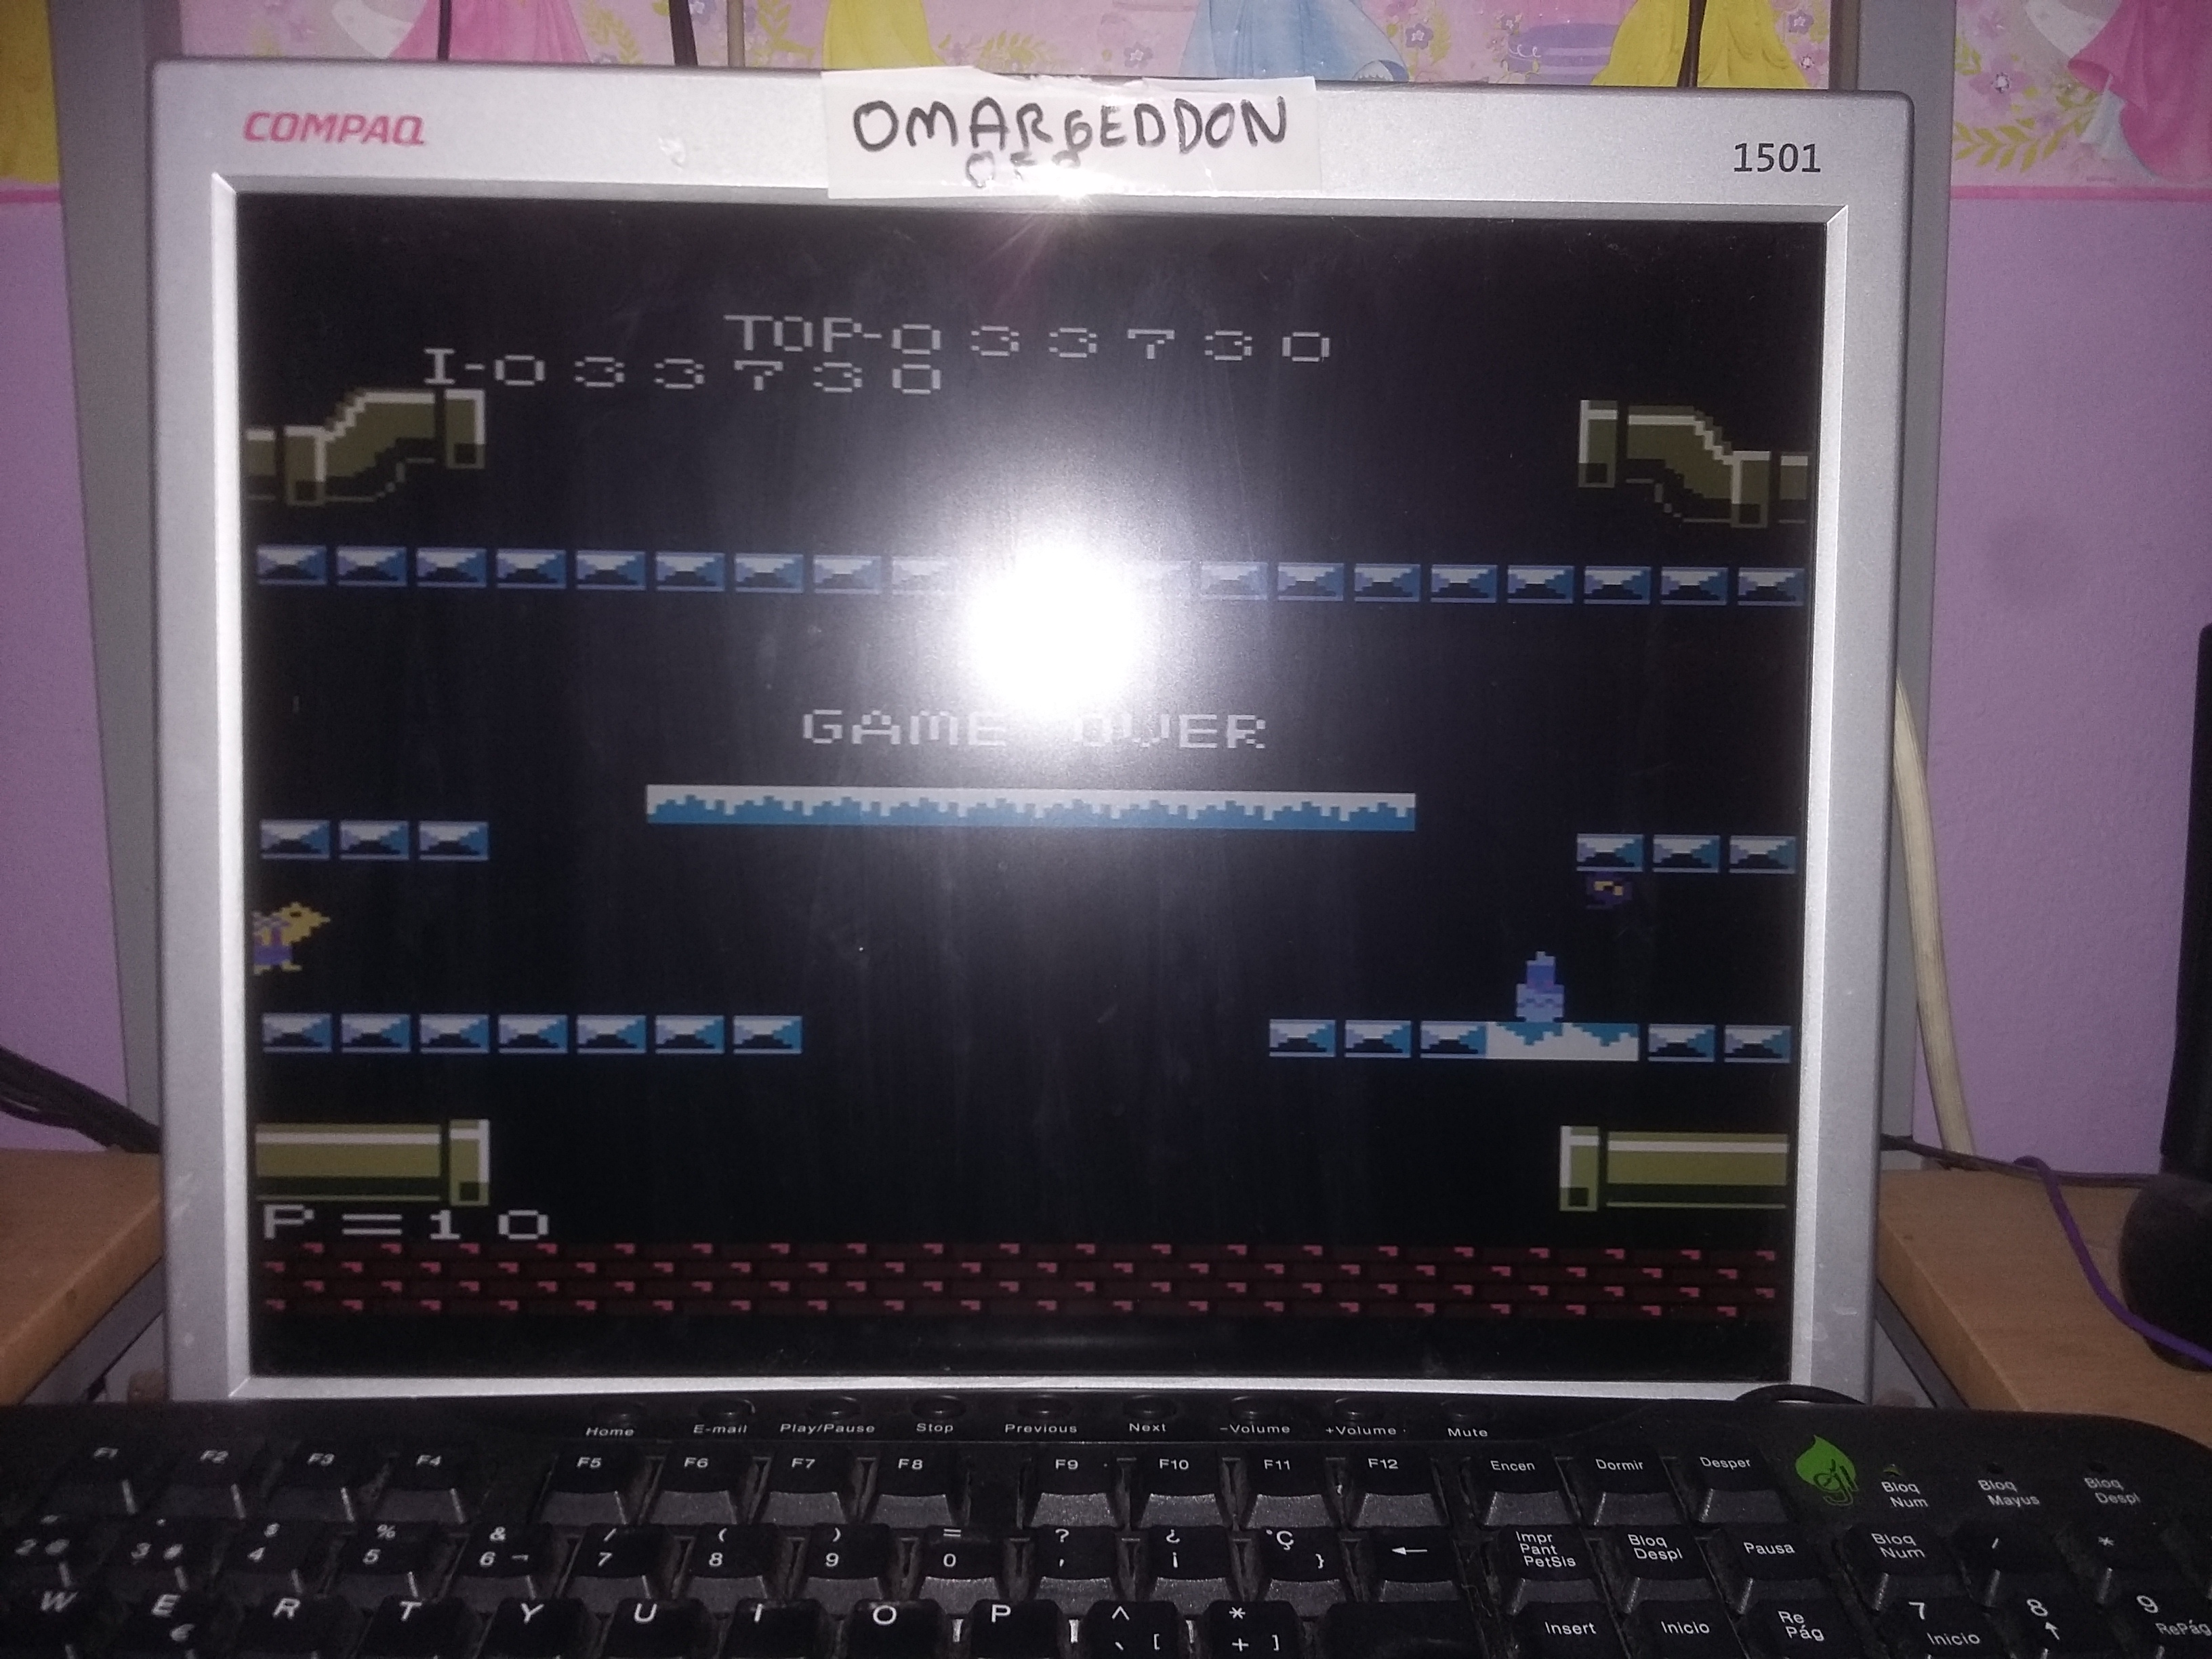 omargeddon: Mario Bros. [Expert] (Atari 7800 Emulated) 33,730 points on 2017-01-09 09:44:31